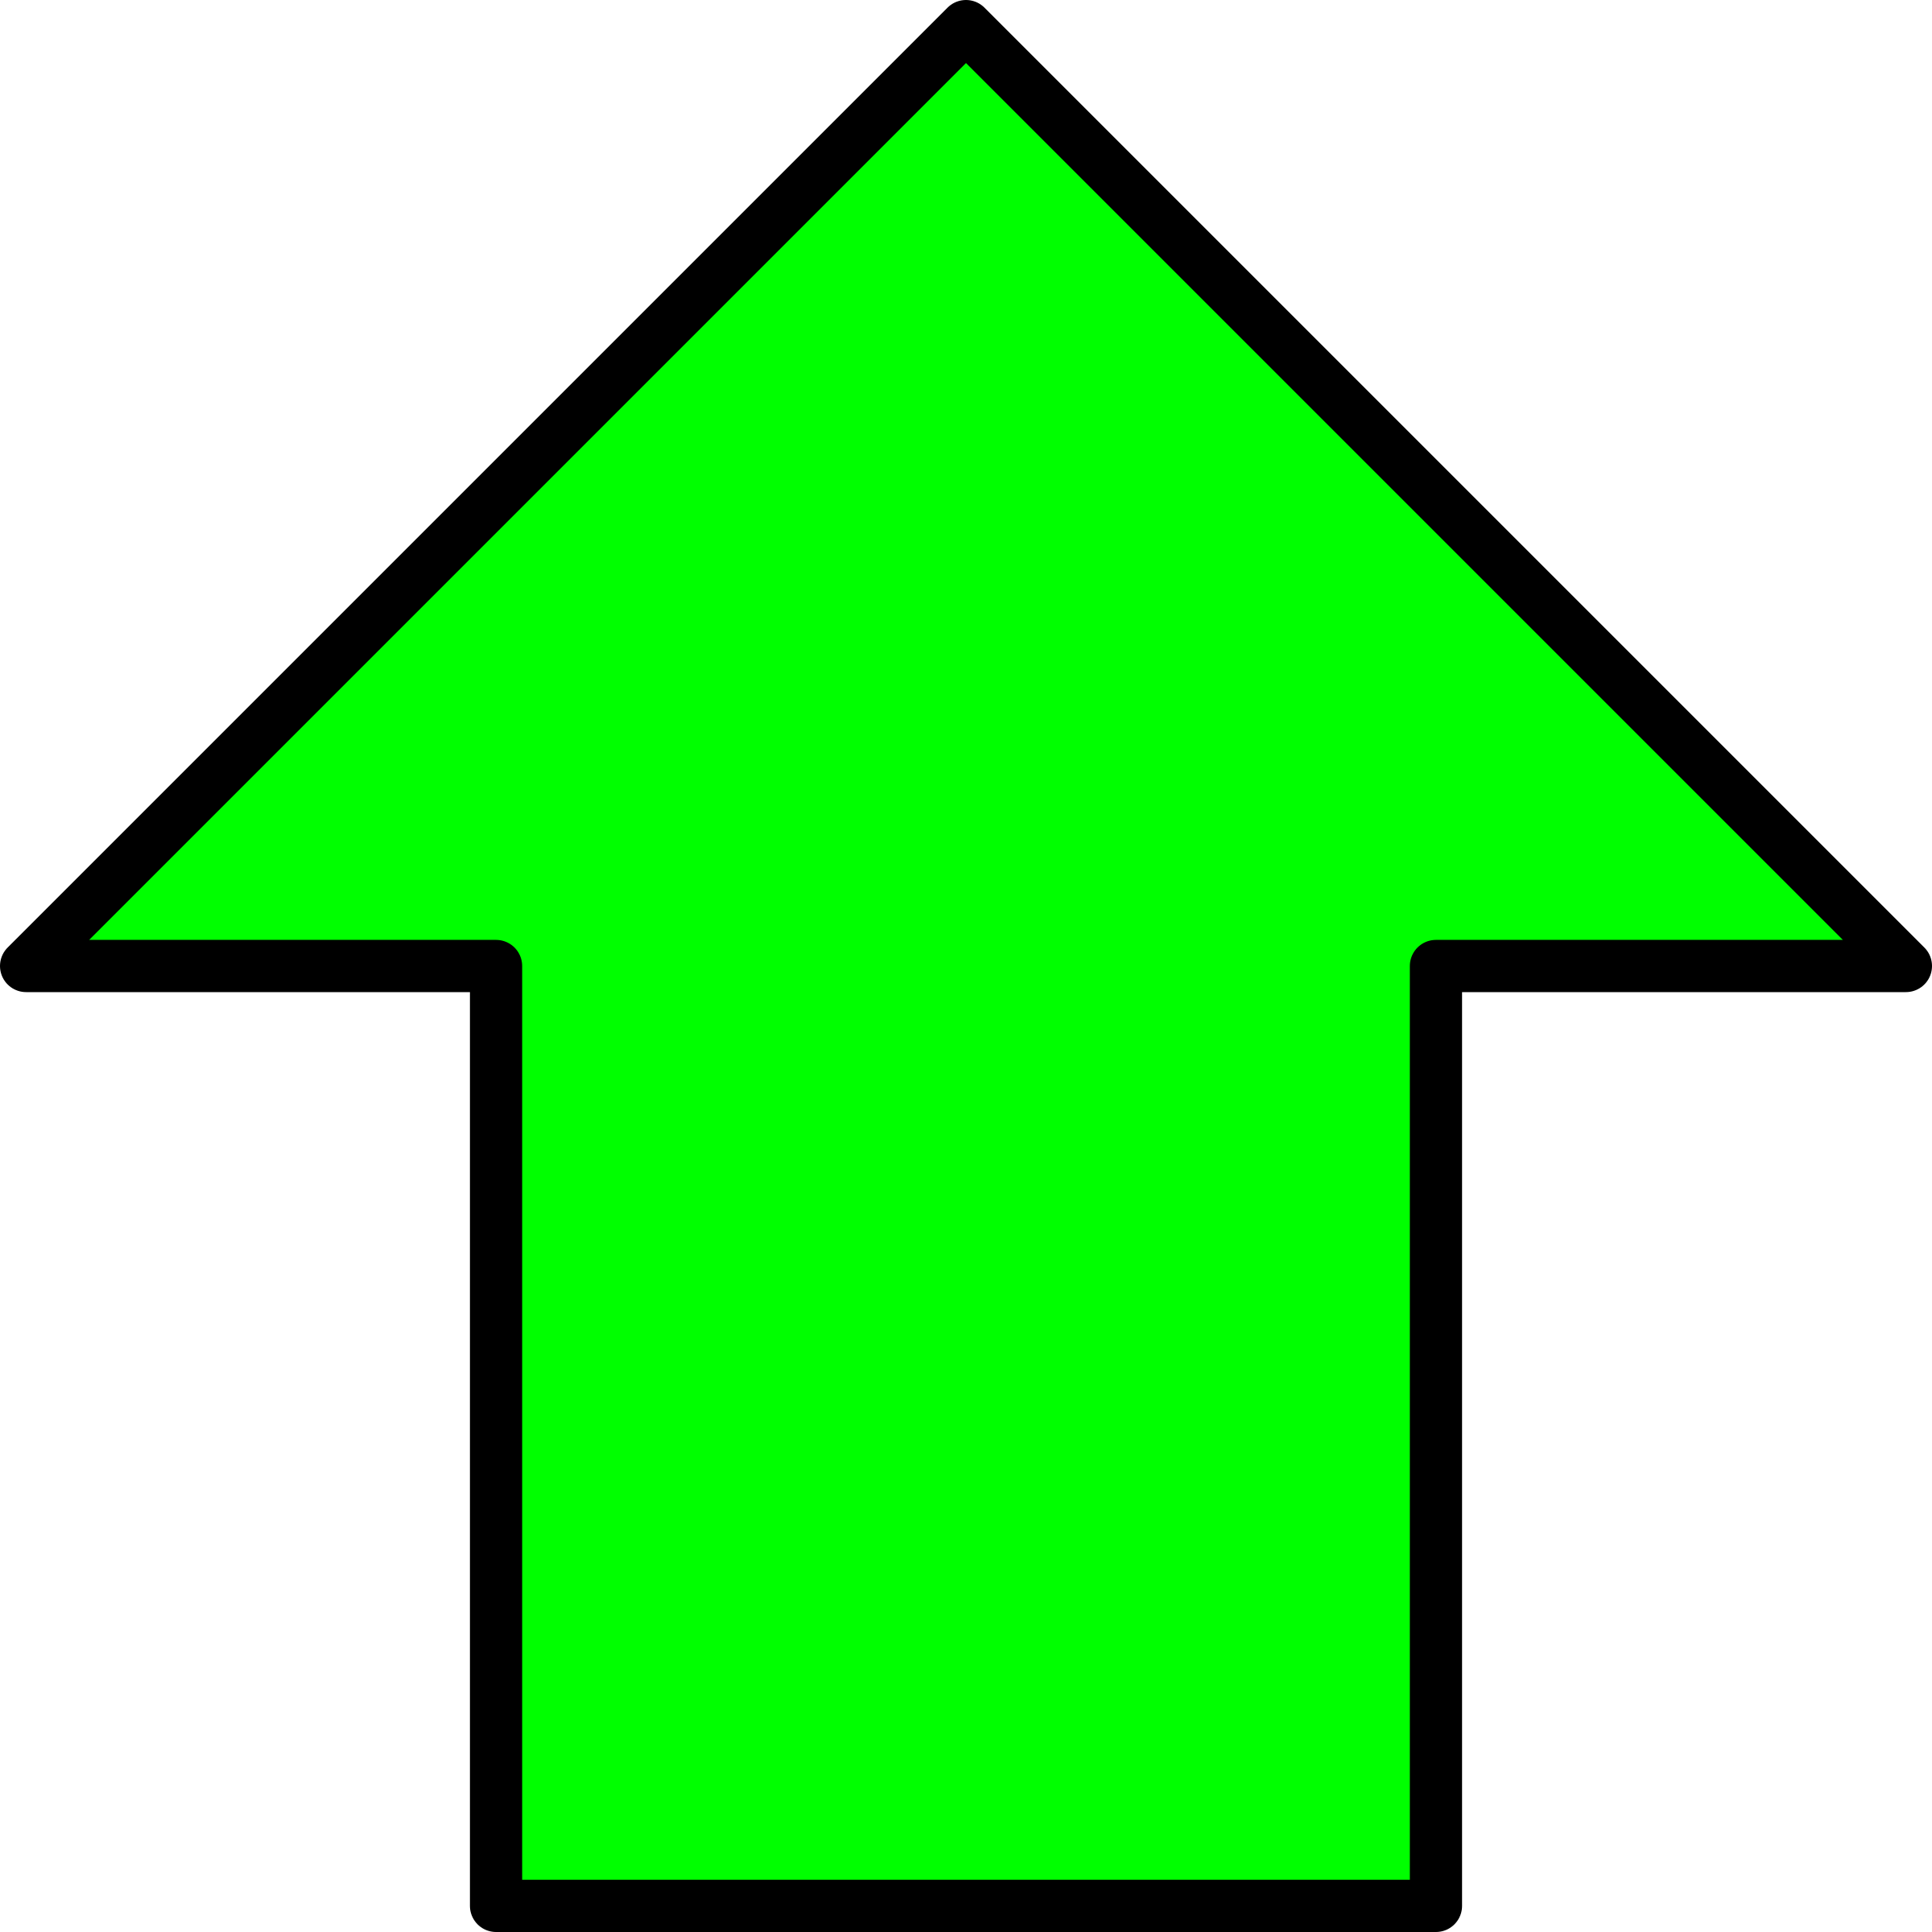 Clip Art Up Arrow. 2016/04/02 Up Arrow U-Clip Art Up Arrow. 2016/04/02 Up Arrow u0026middot; Big Image Png-4